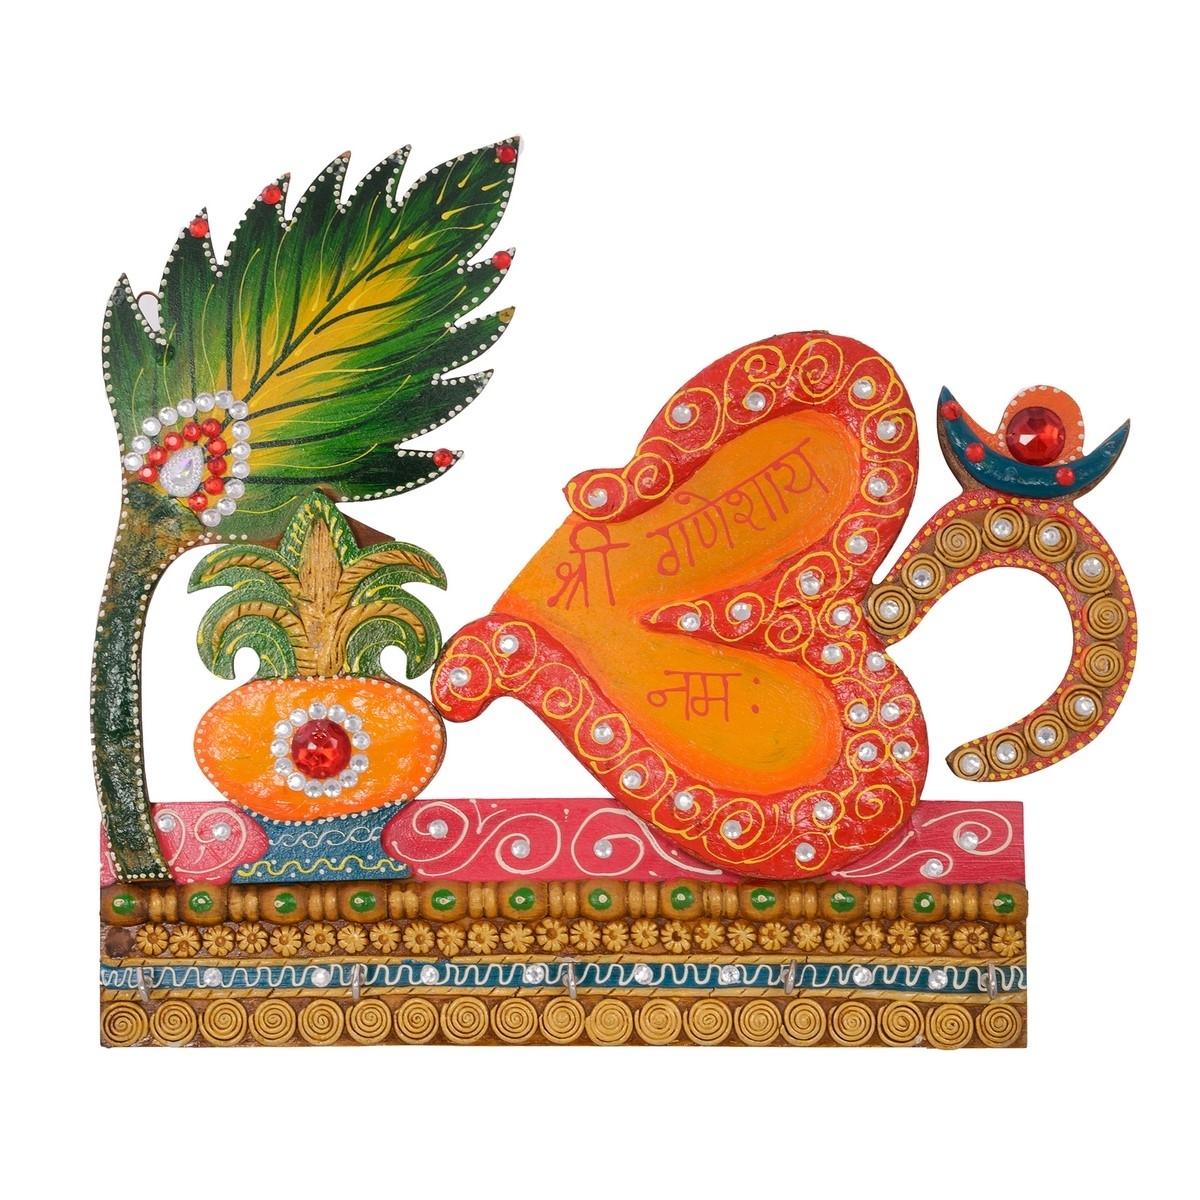 Papier-Mache Om and Krishna Design Key Holder Indian Home Decor